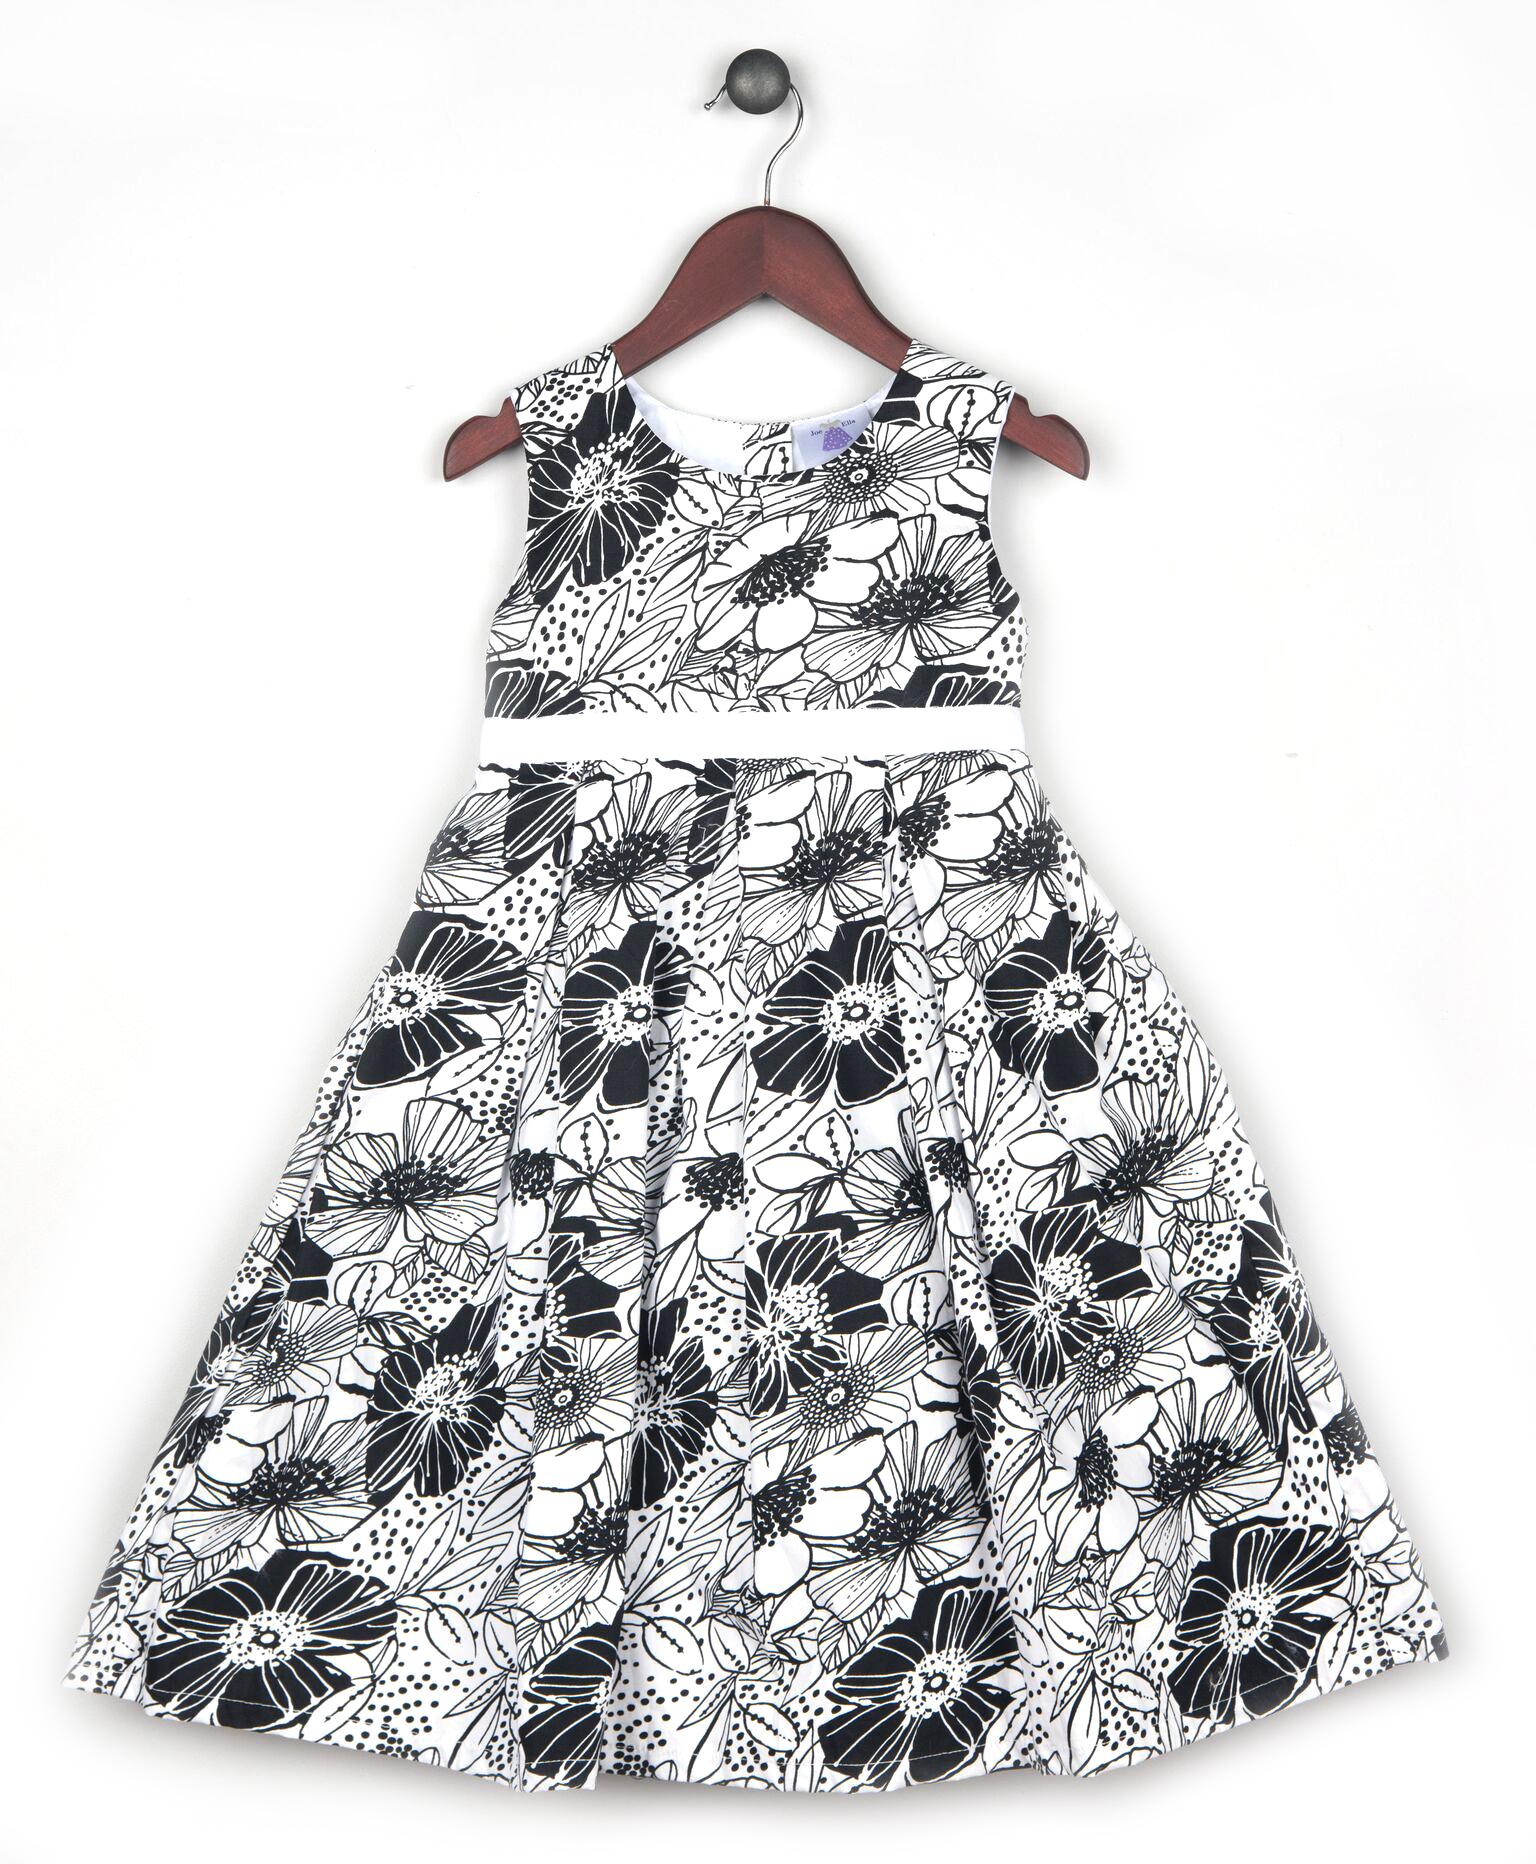 Joe and Ella Fashion Dievčenské šaty Amy - čierno-biele f73f045ee49